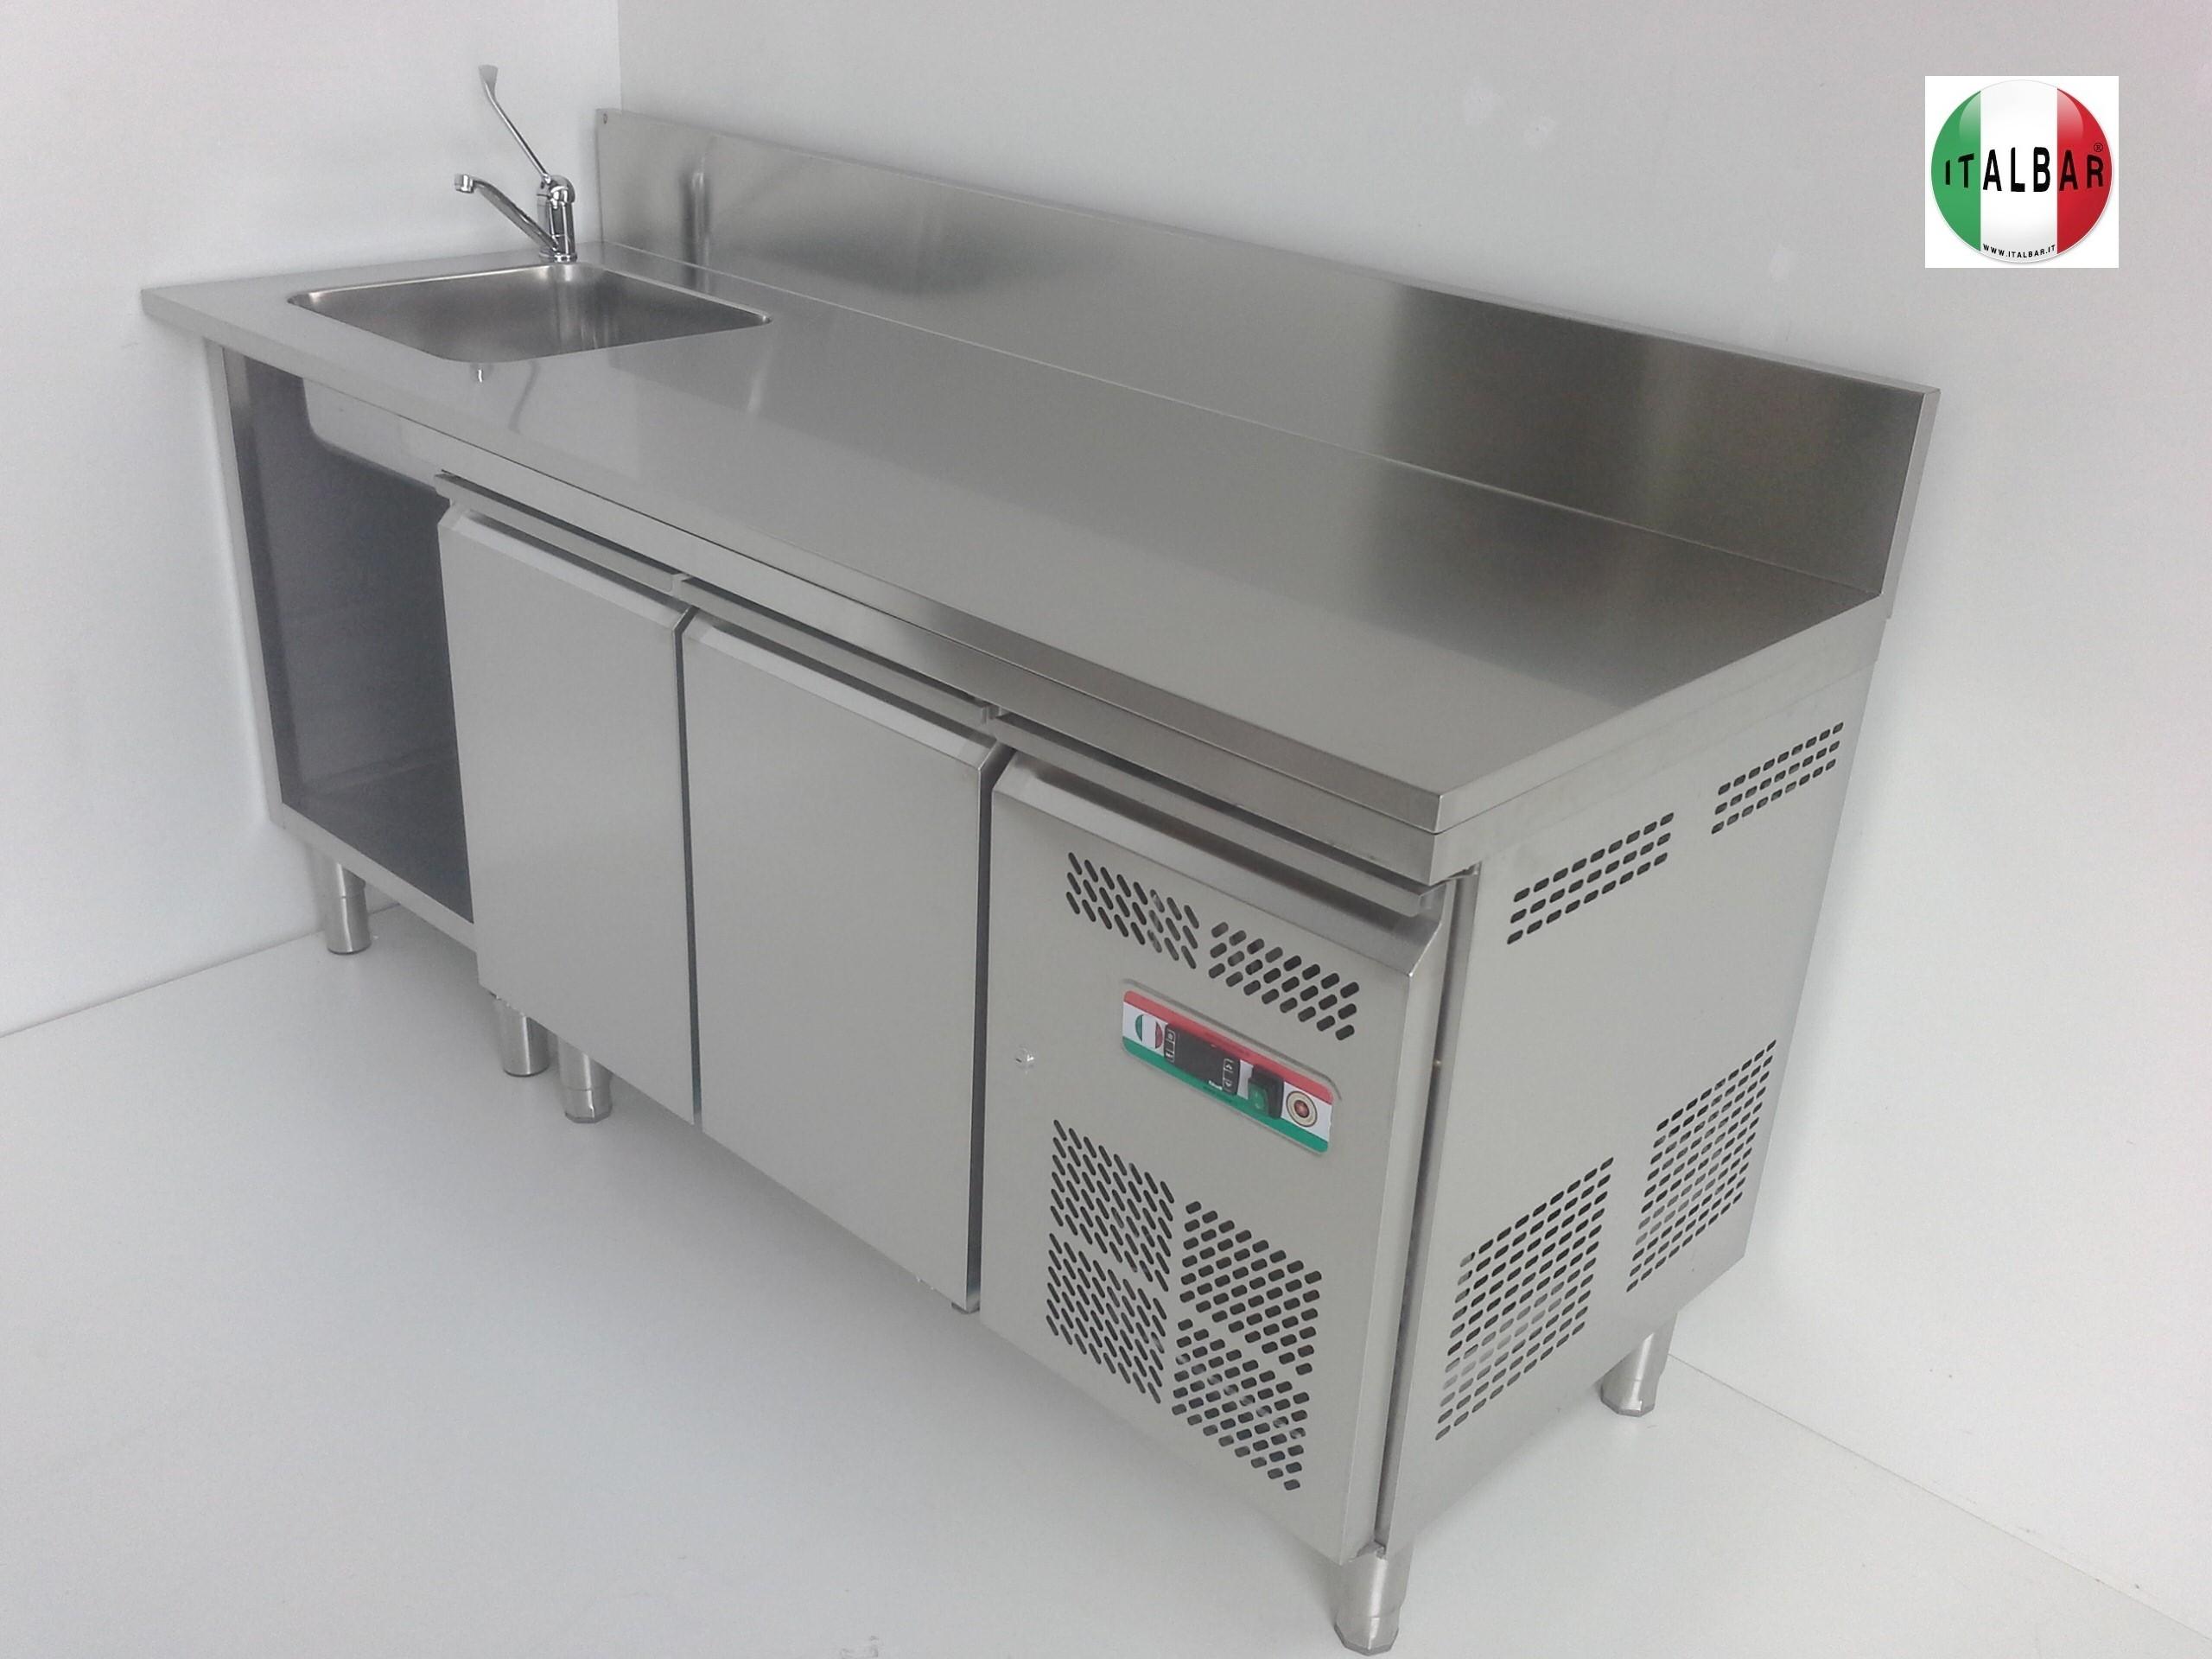 Italbar Banconi Bar Banchi Frigo Vetrine Refrigerate Banco Bar